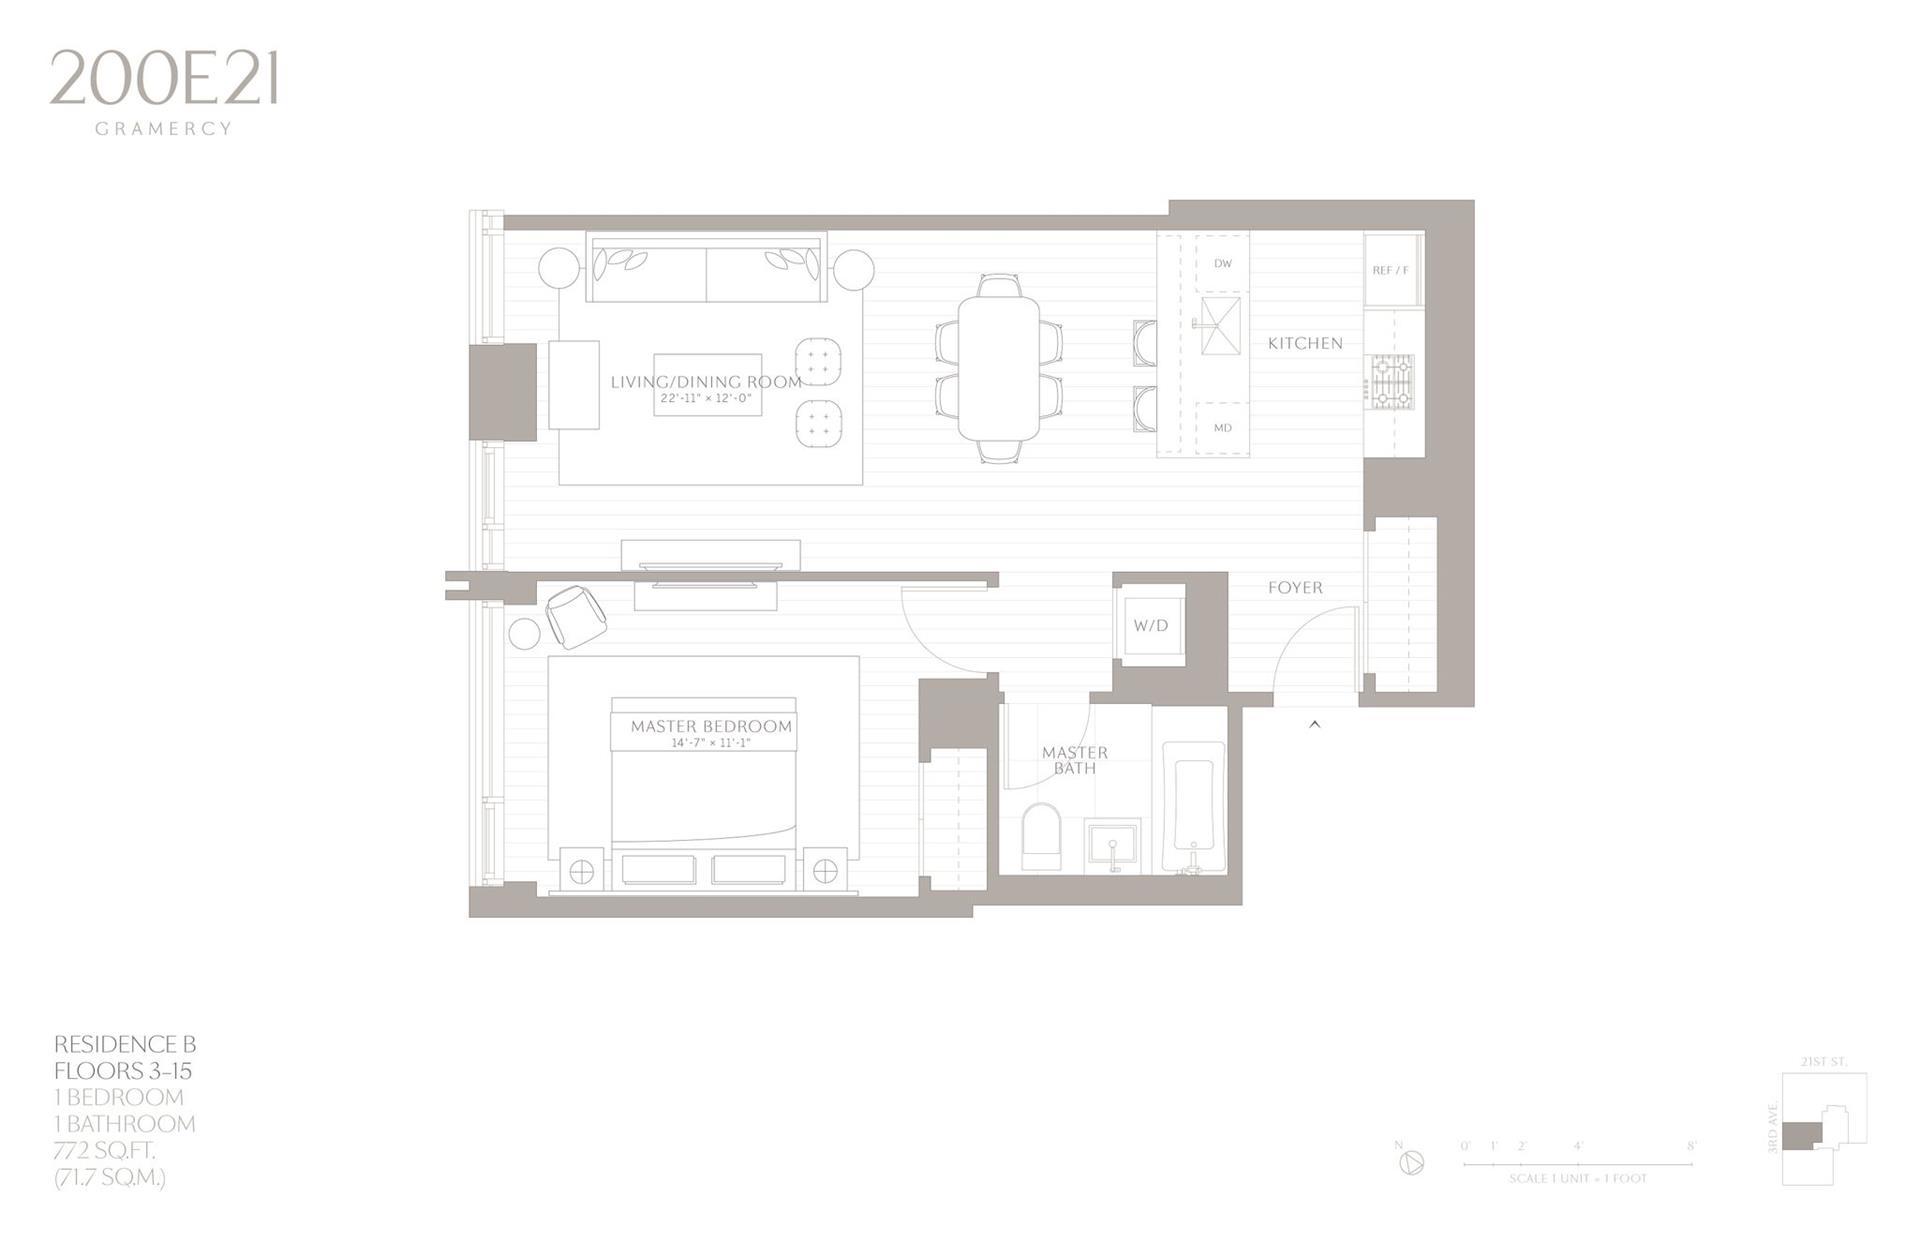 Floor plan of 200 East 21st Street, 5B - Gramercy - Union Square, New York